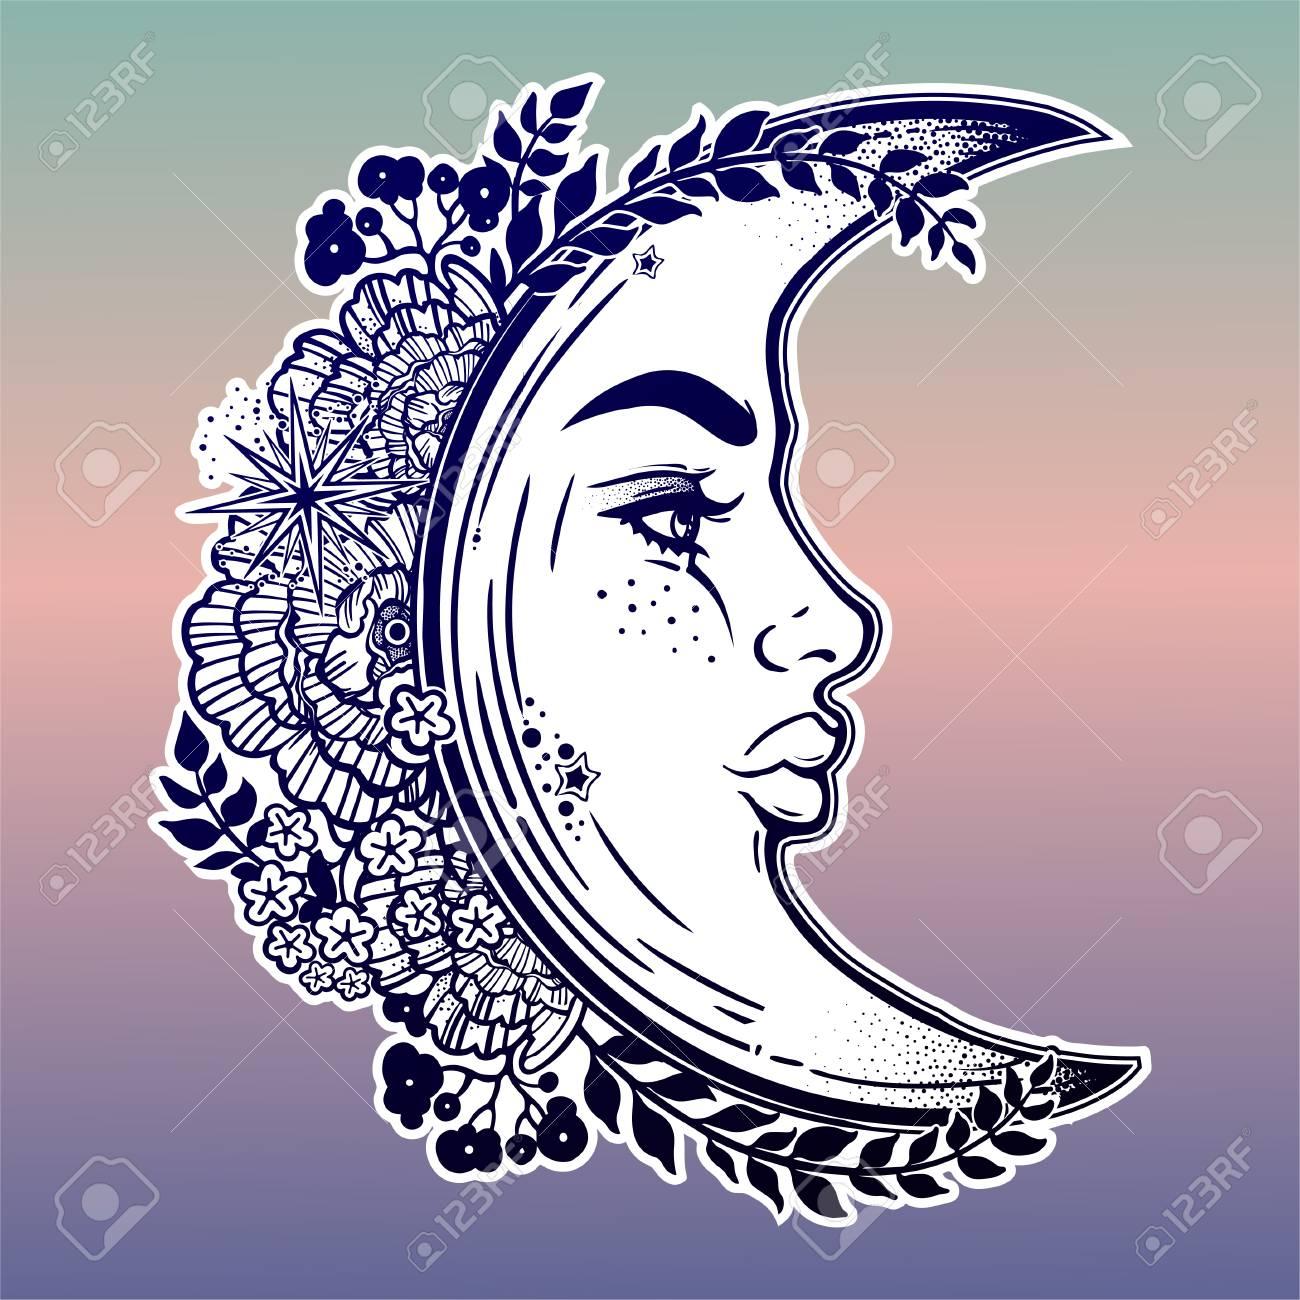 Romantic Crescent Moon As A Beautiful Woman Face Illustration Stock Vector